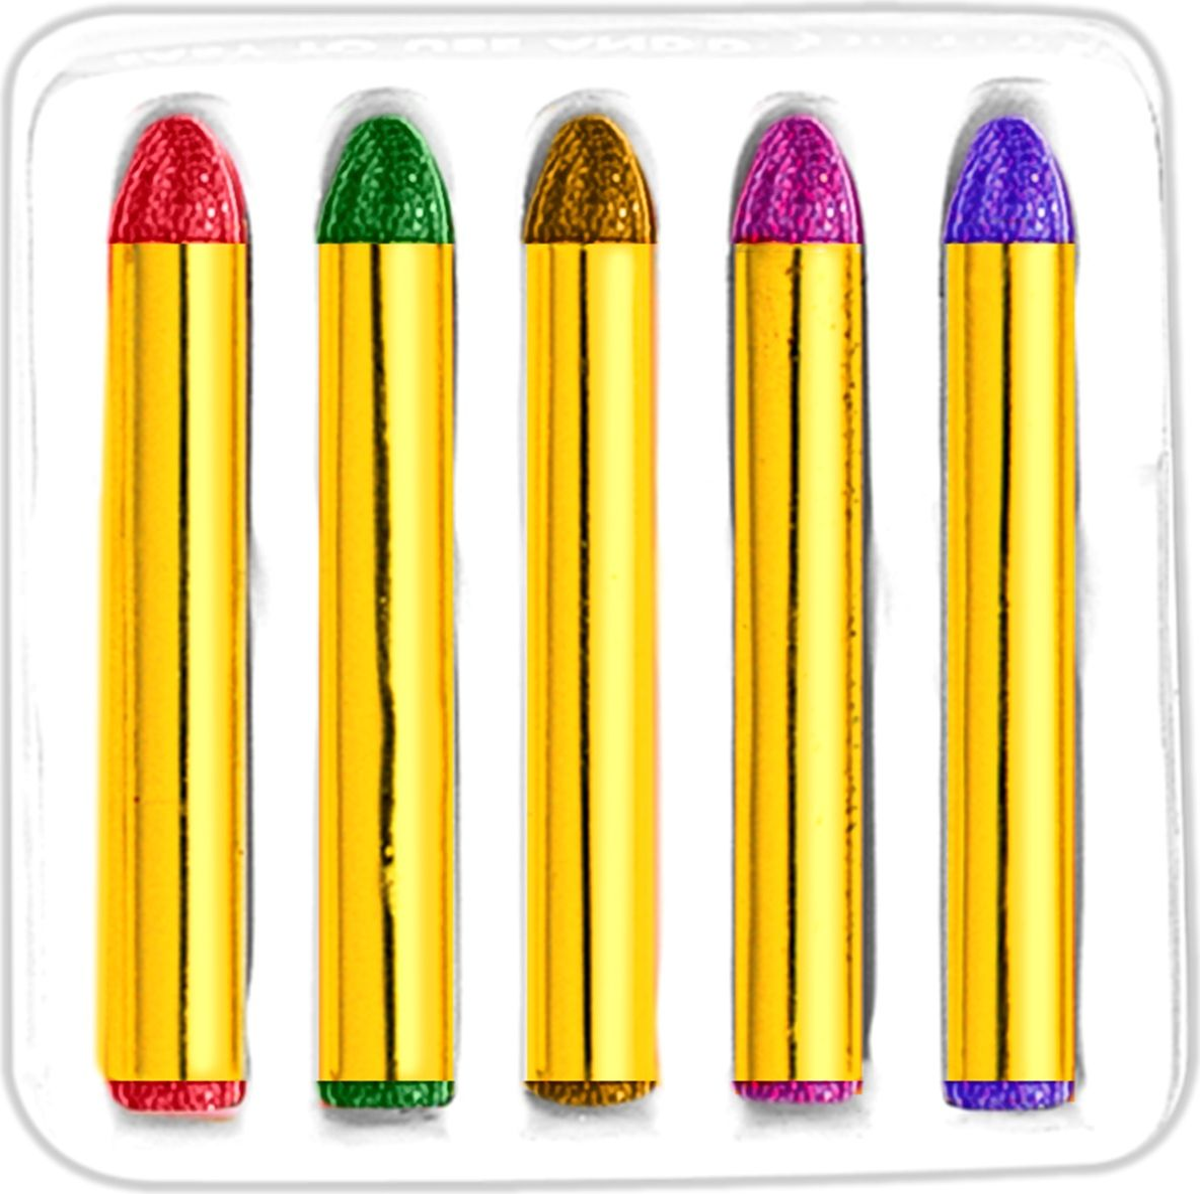 Glitter schminkstiften 5 stuks